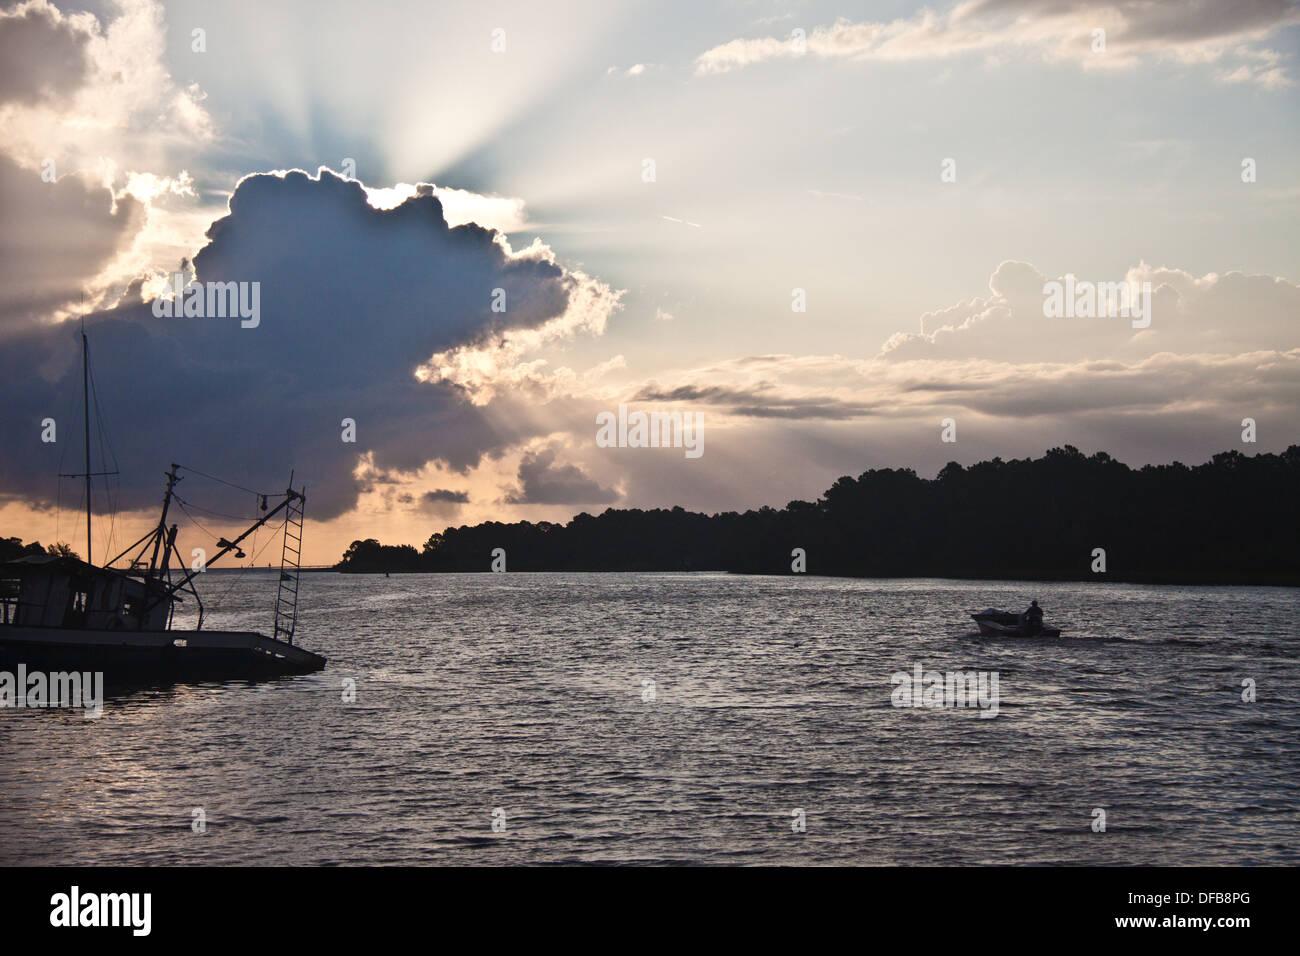 Fisherman heading out at sunrise - Stock Image